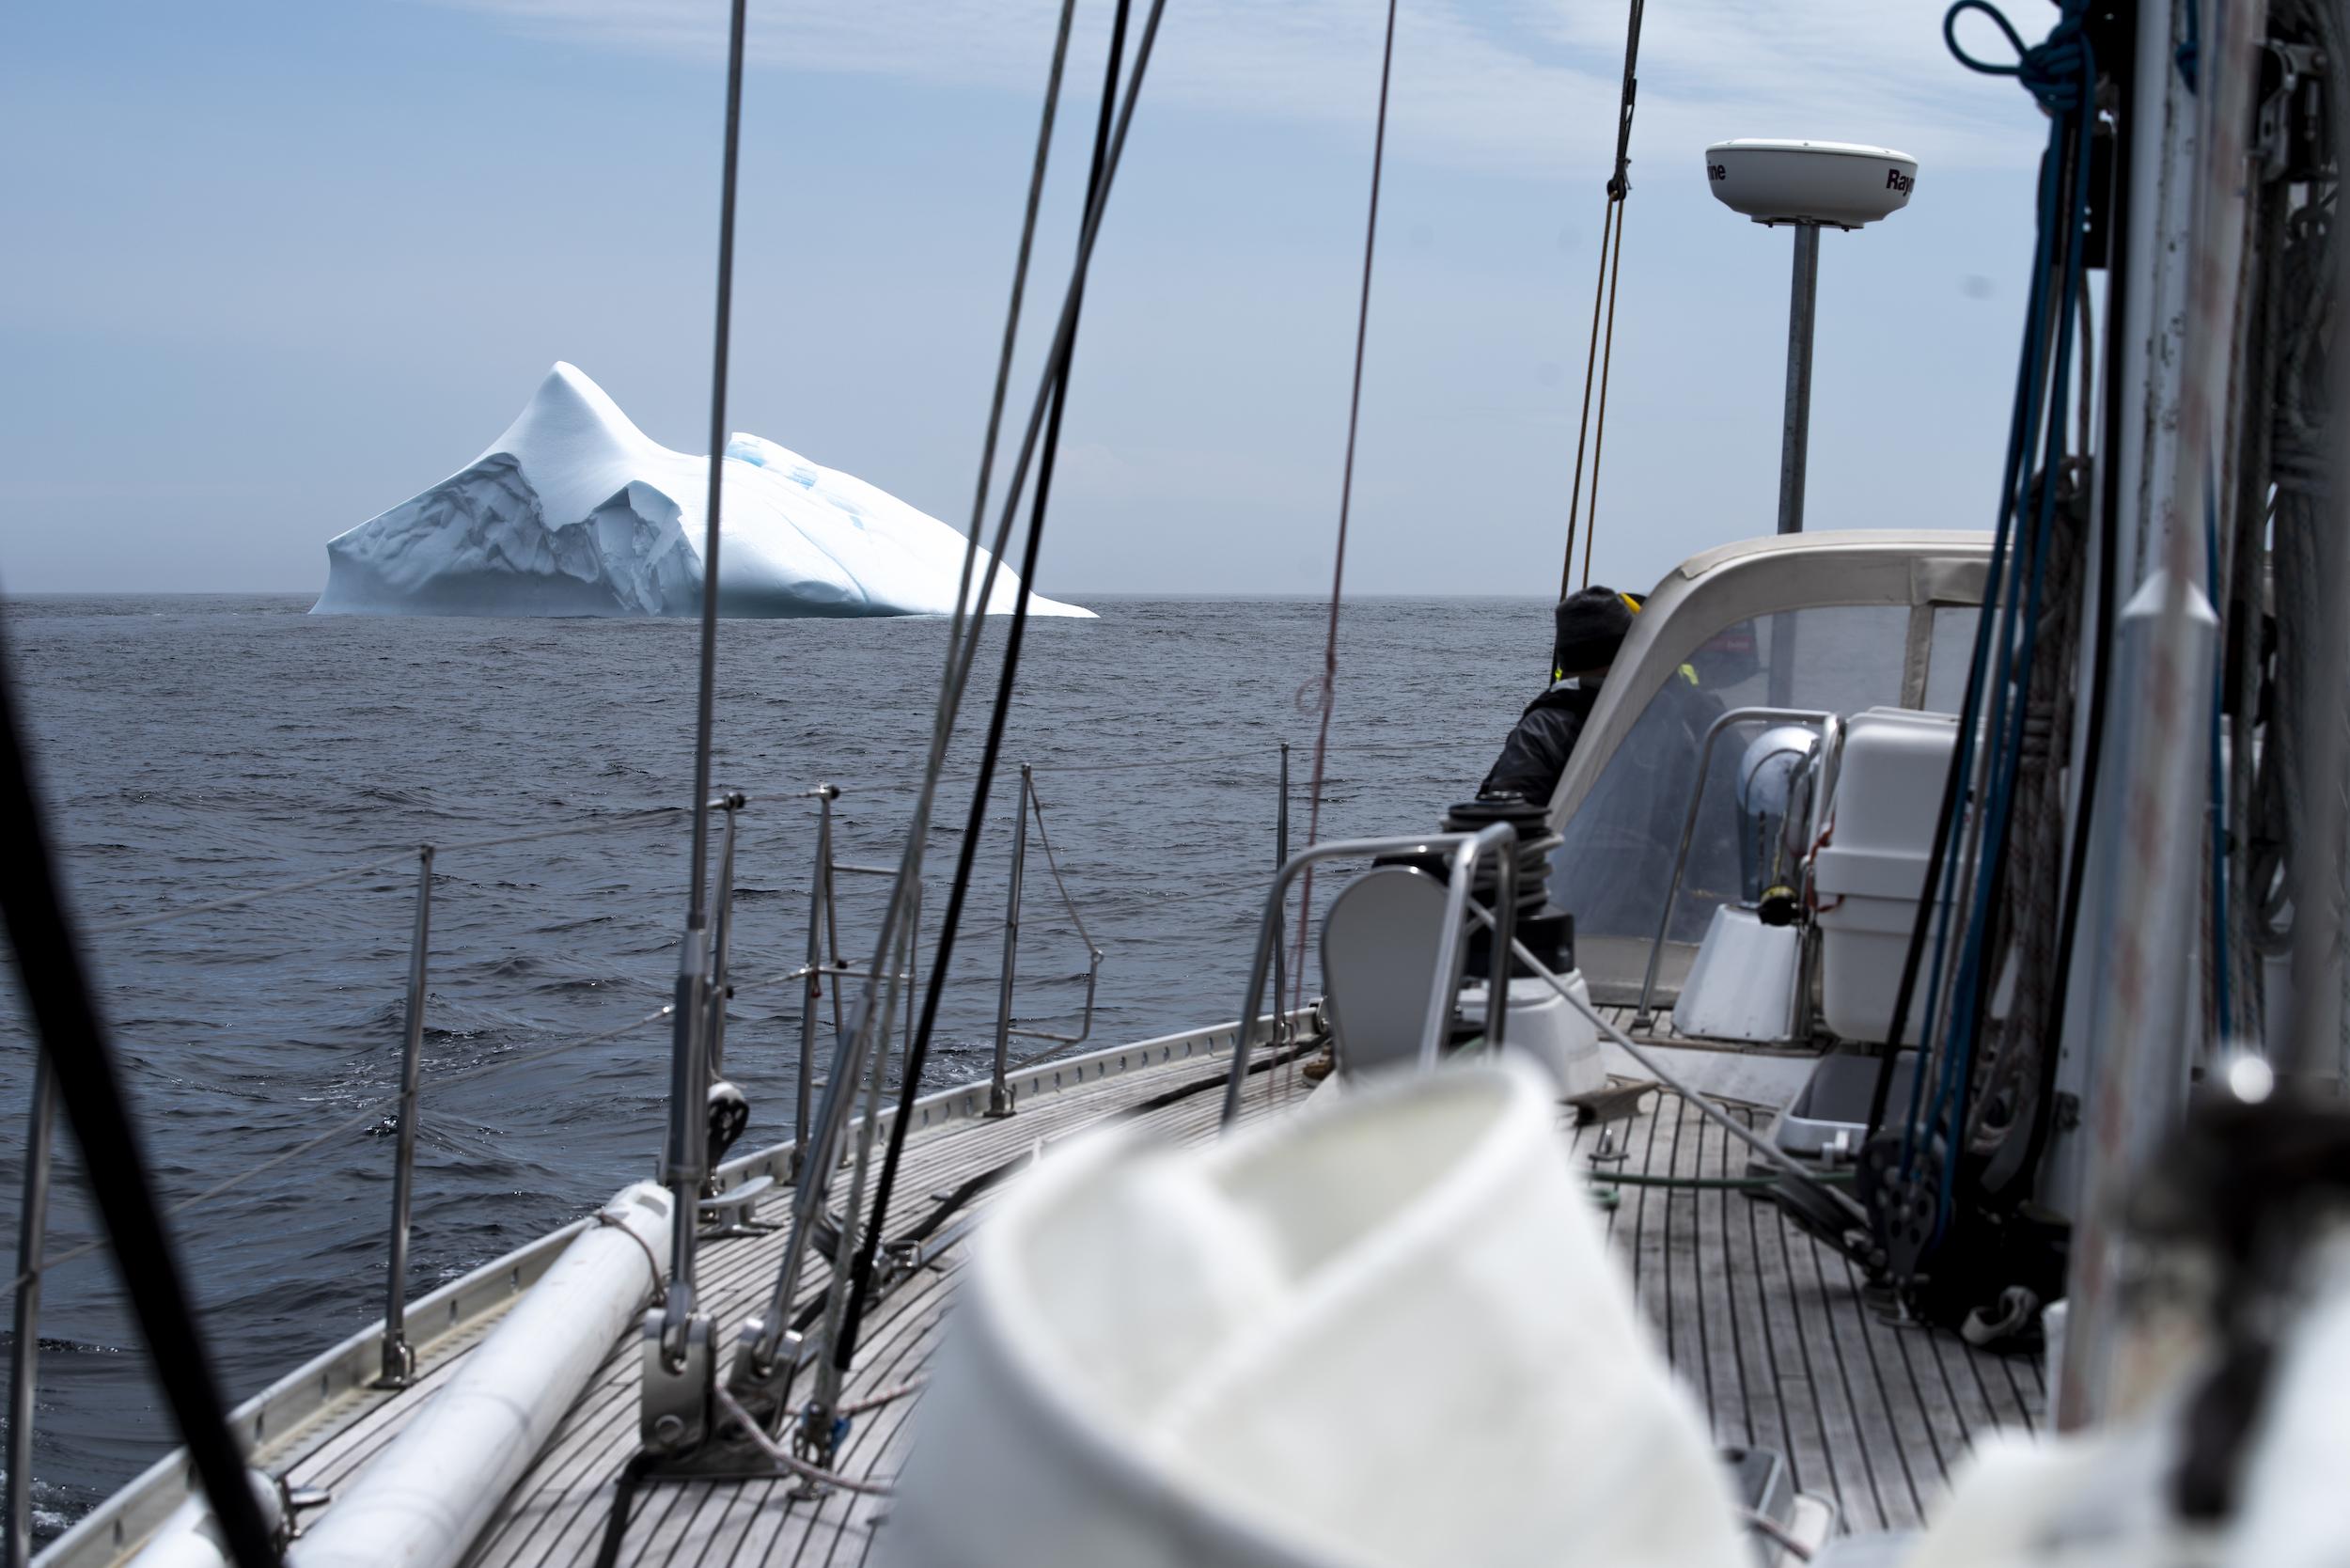 19.06.24_Iceberg 2 Sailaway_2500.jpg